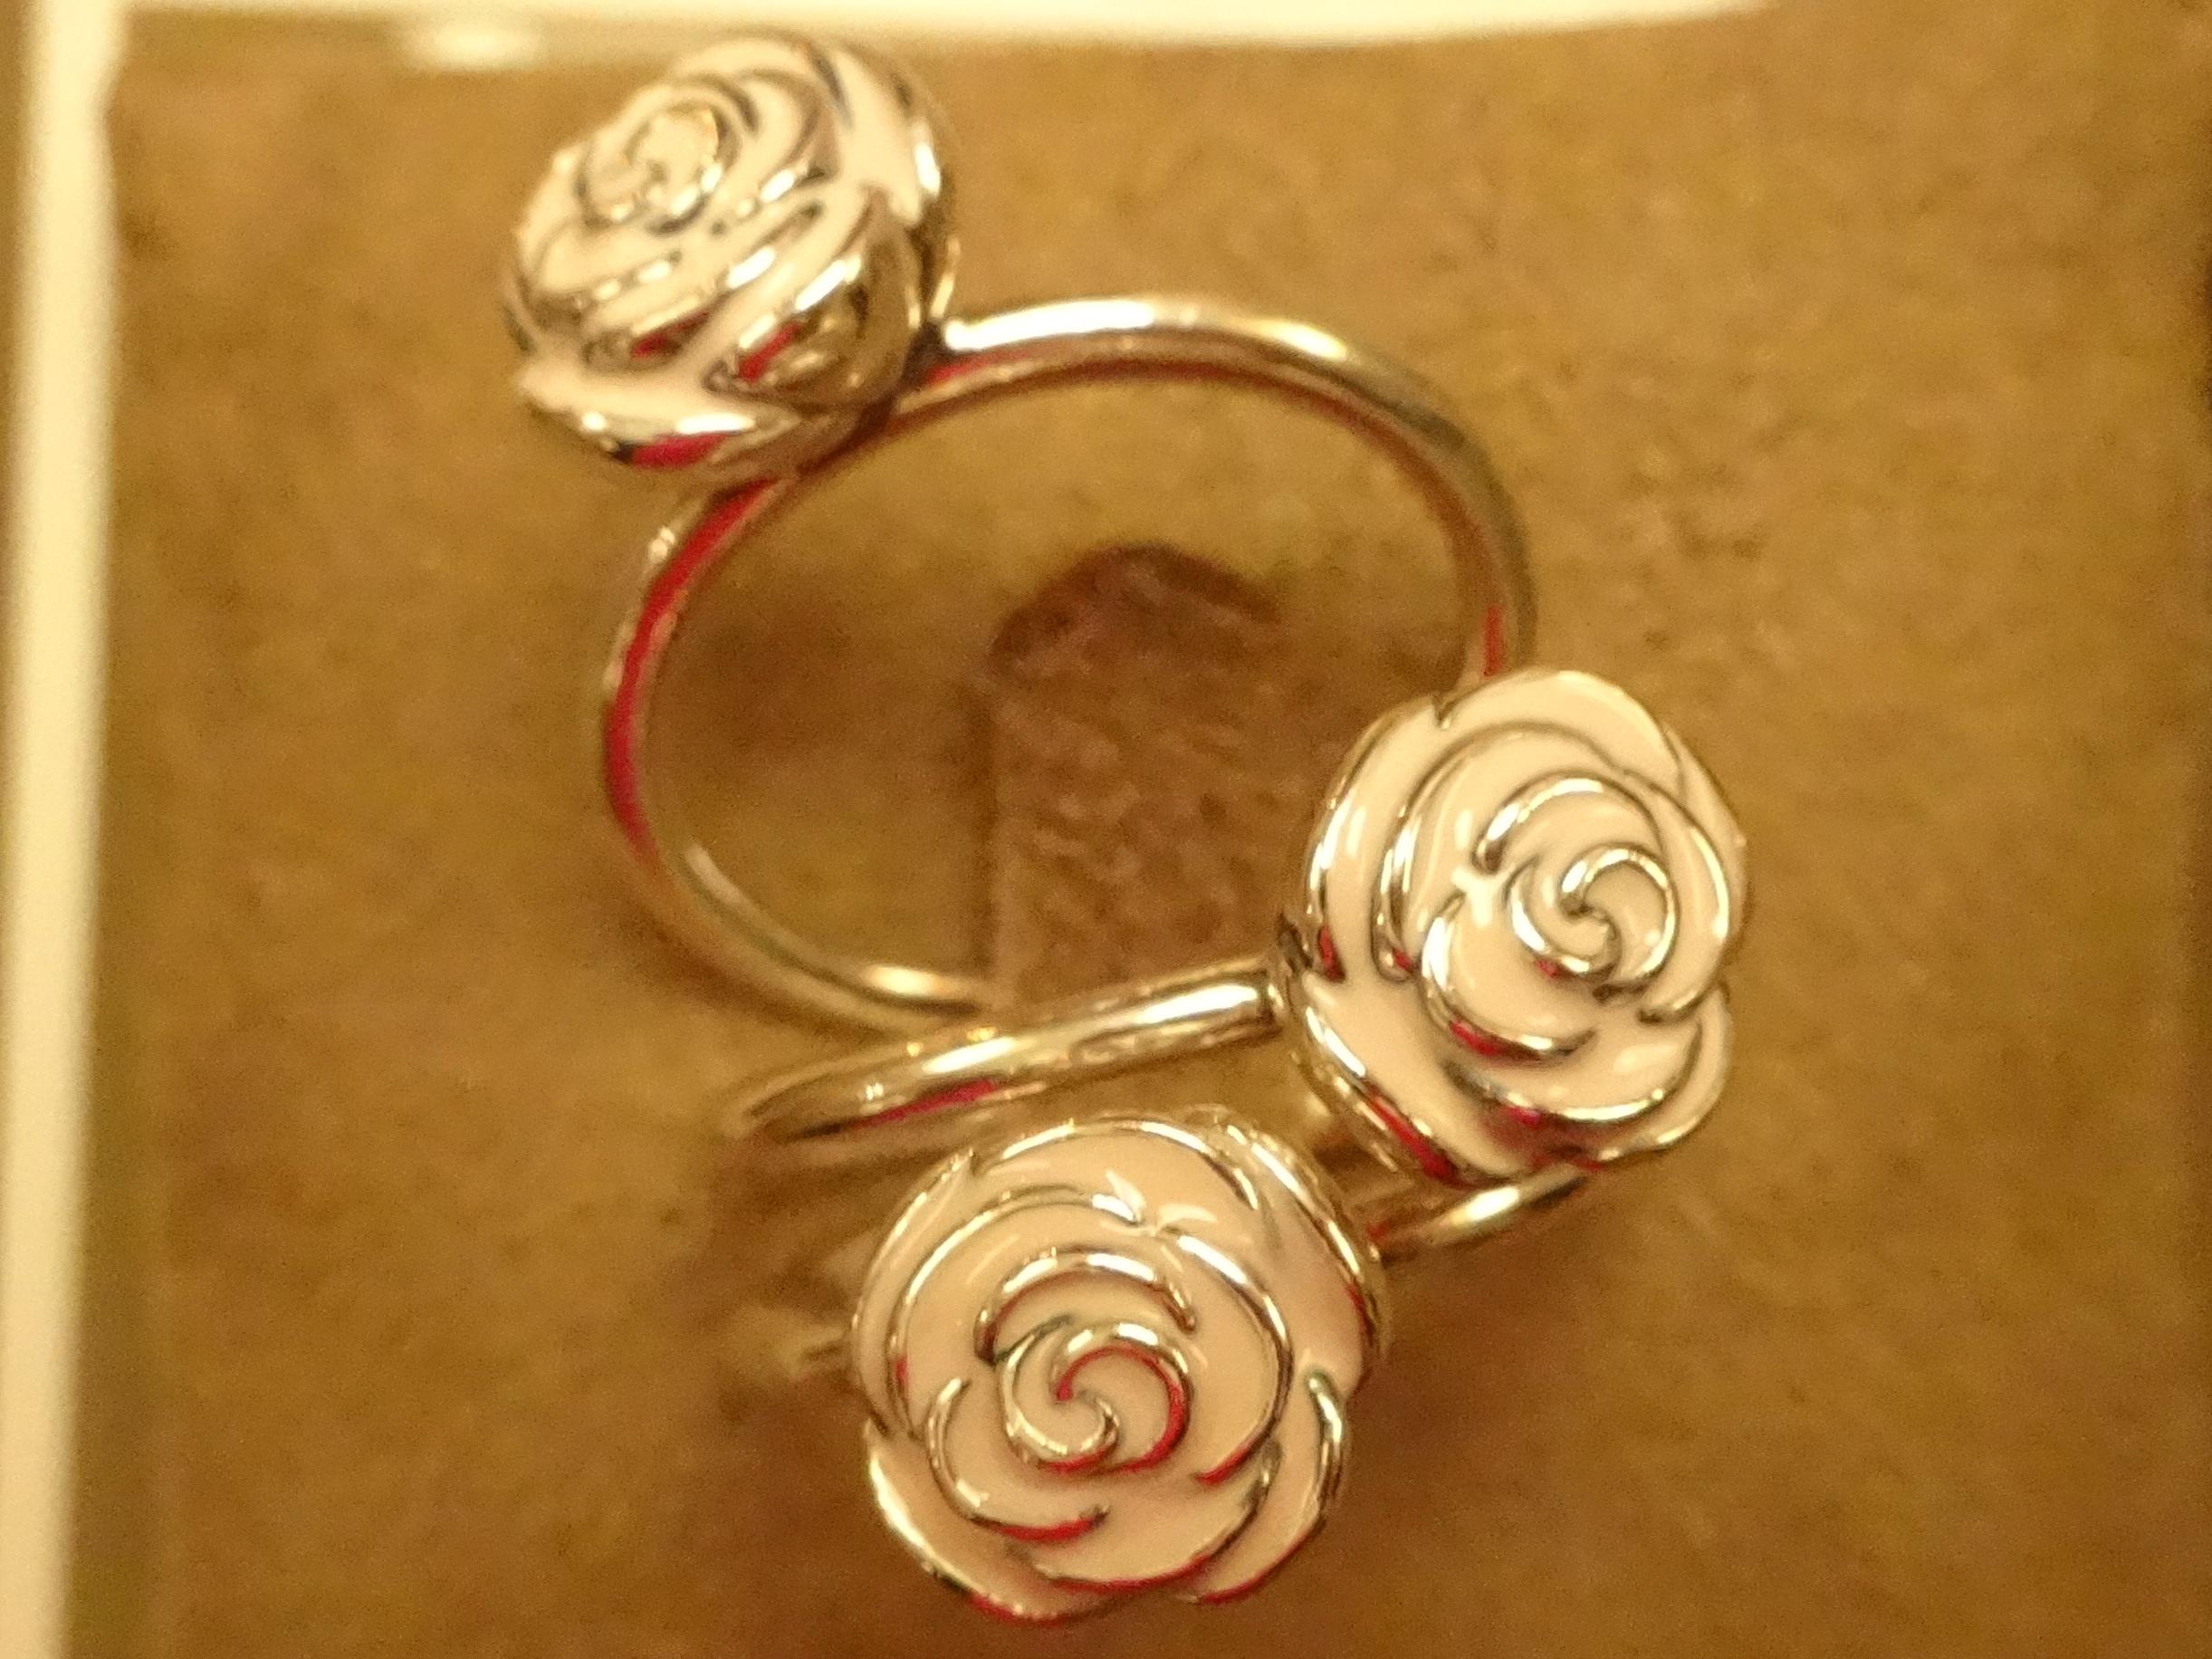 Rosen-Ringe, Sterling-Silber und Emaille